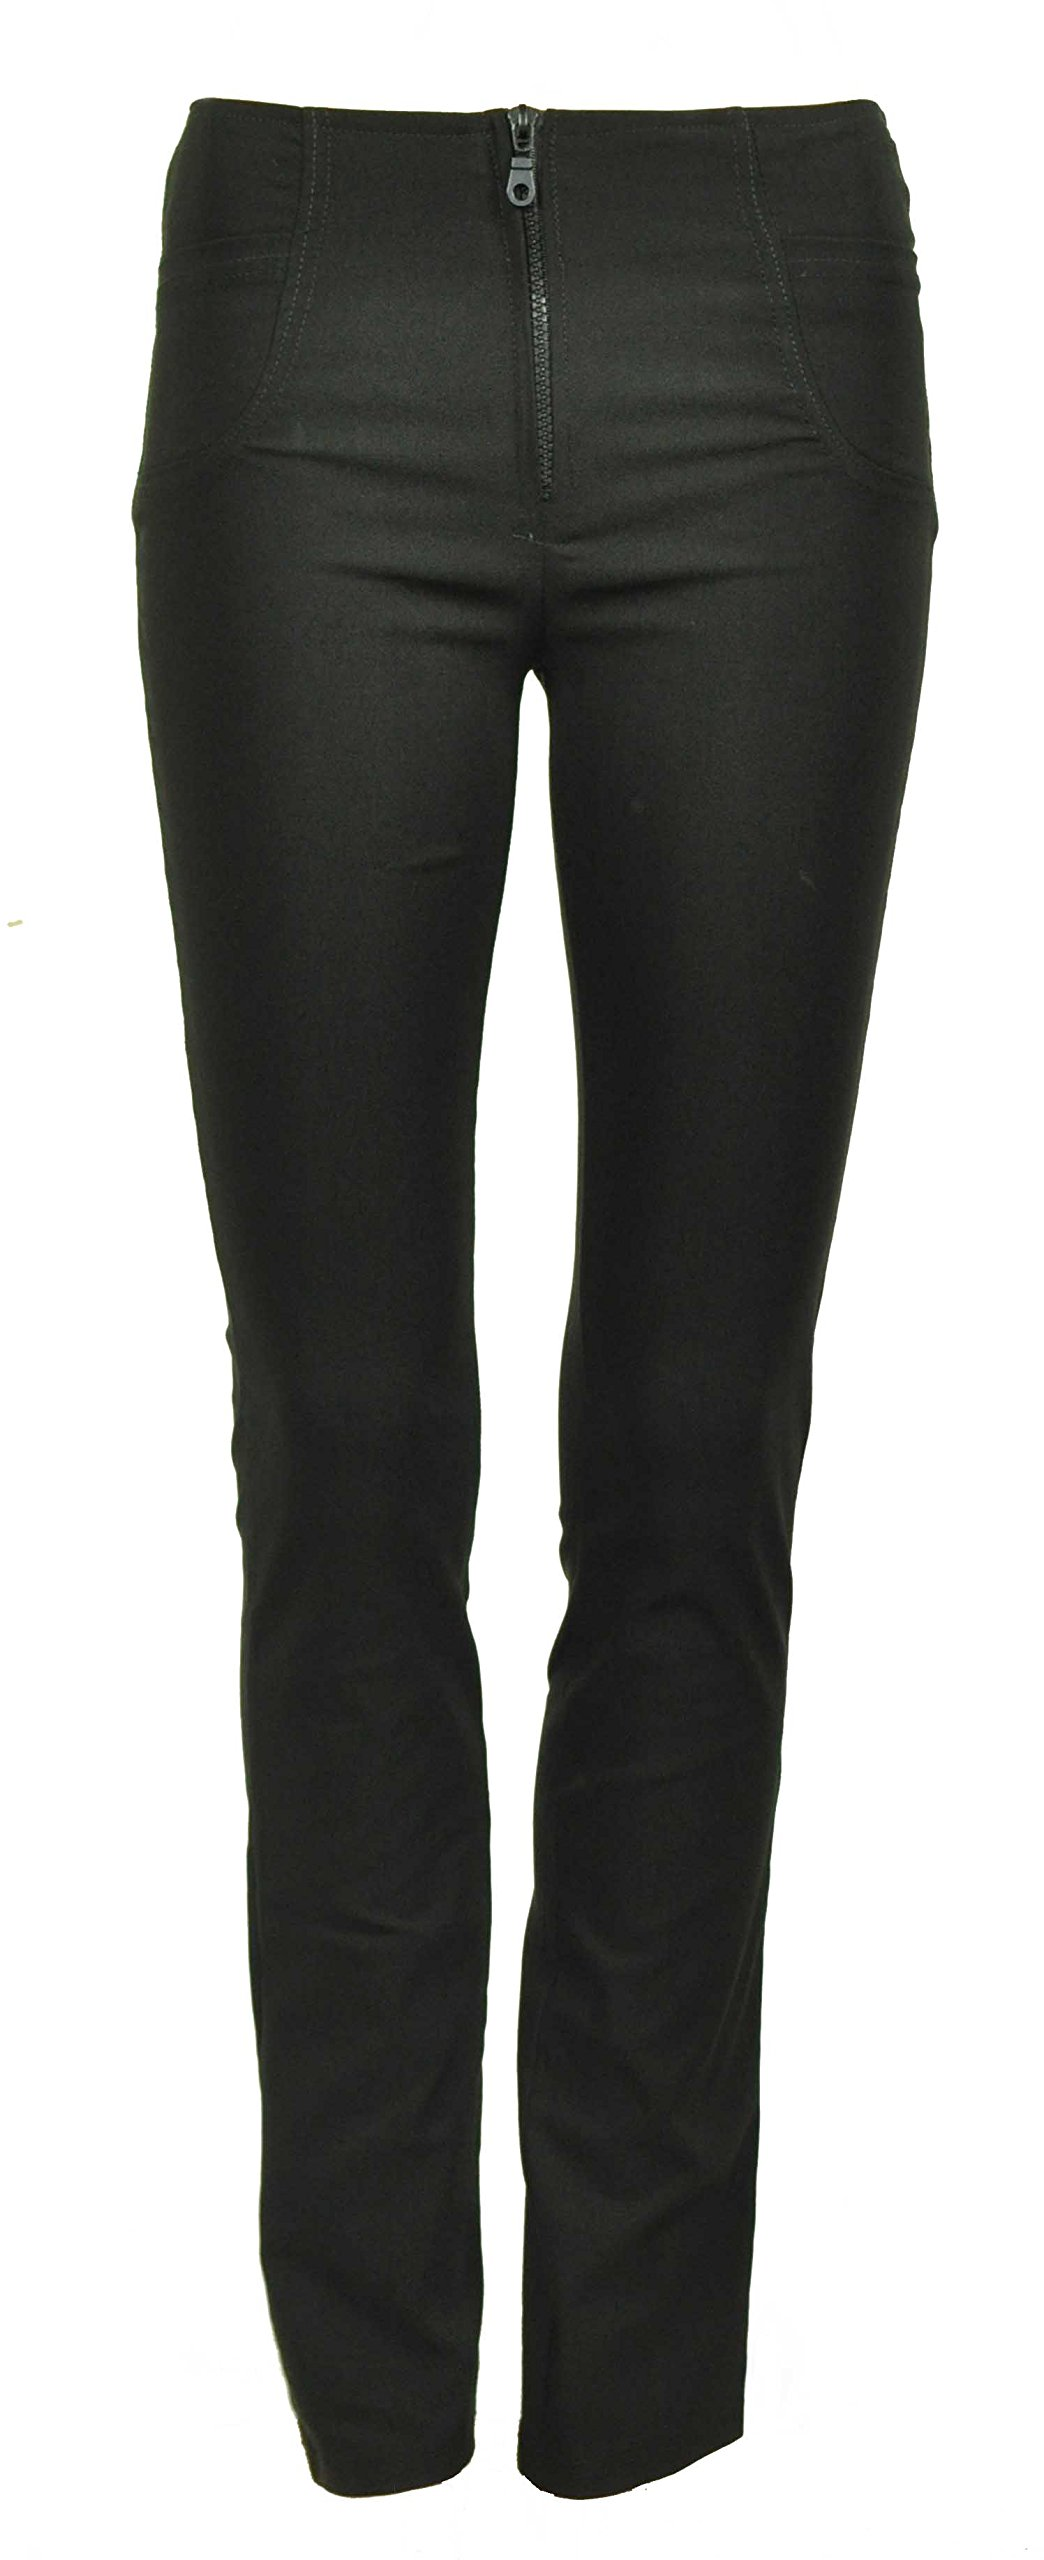 Purple Hanger PurpleHanger Women's Hipster Zip Skinny Leg Fit Pants Black 10 31'' Leg